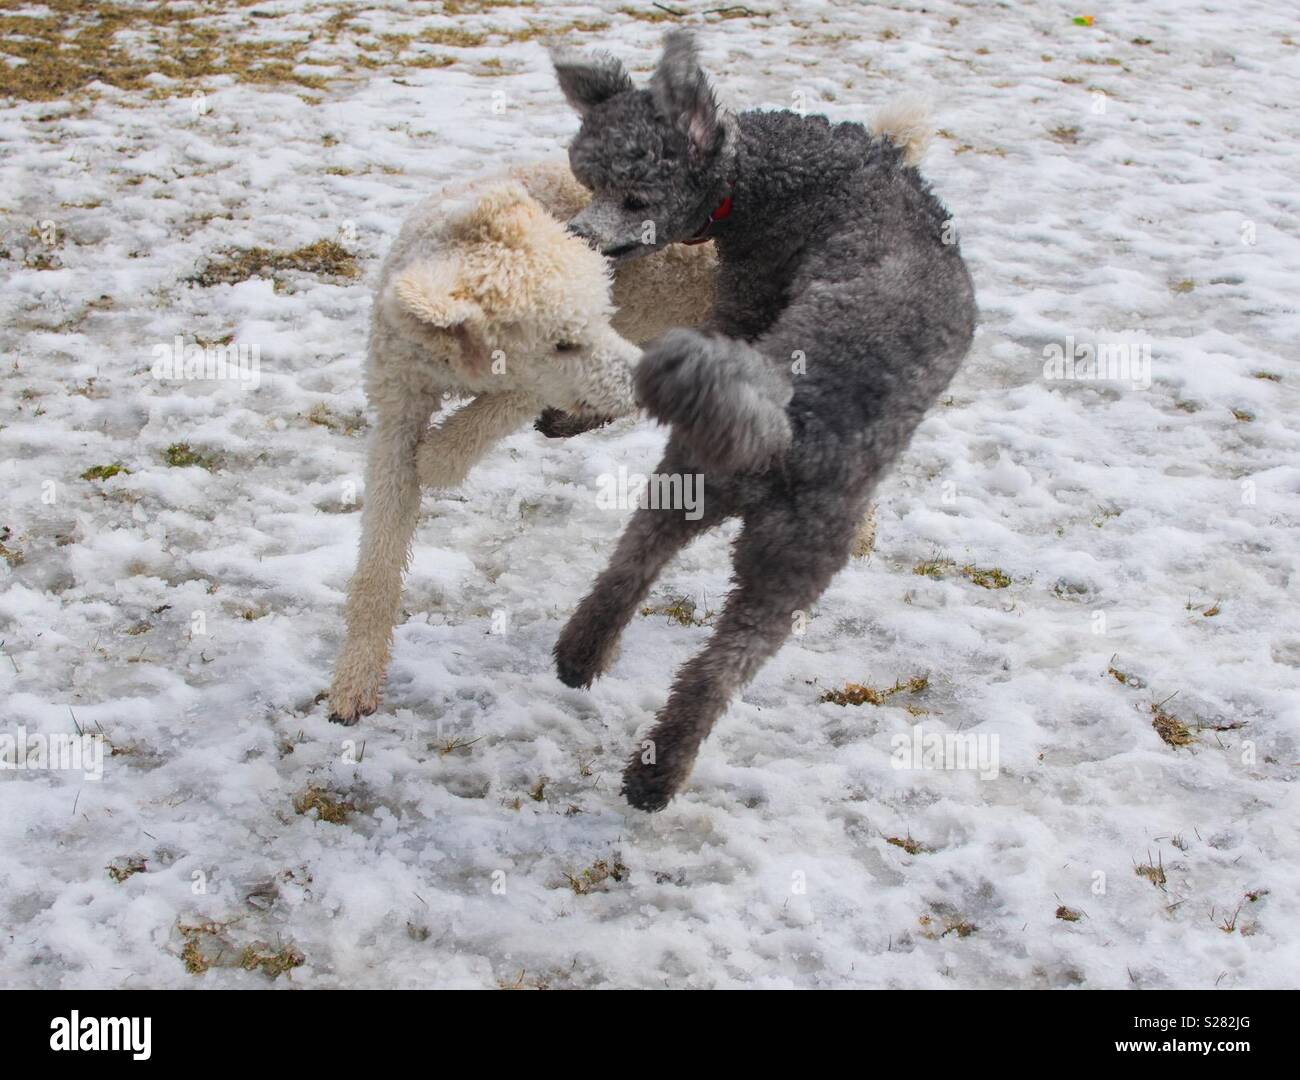 2 poodles playing - Stock Image